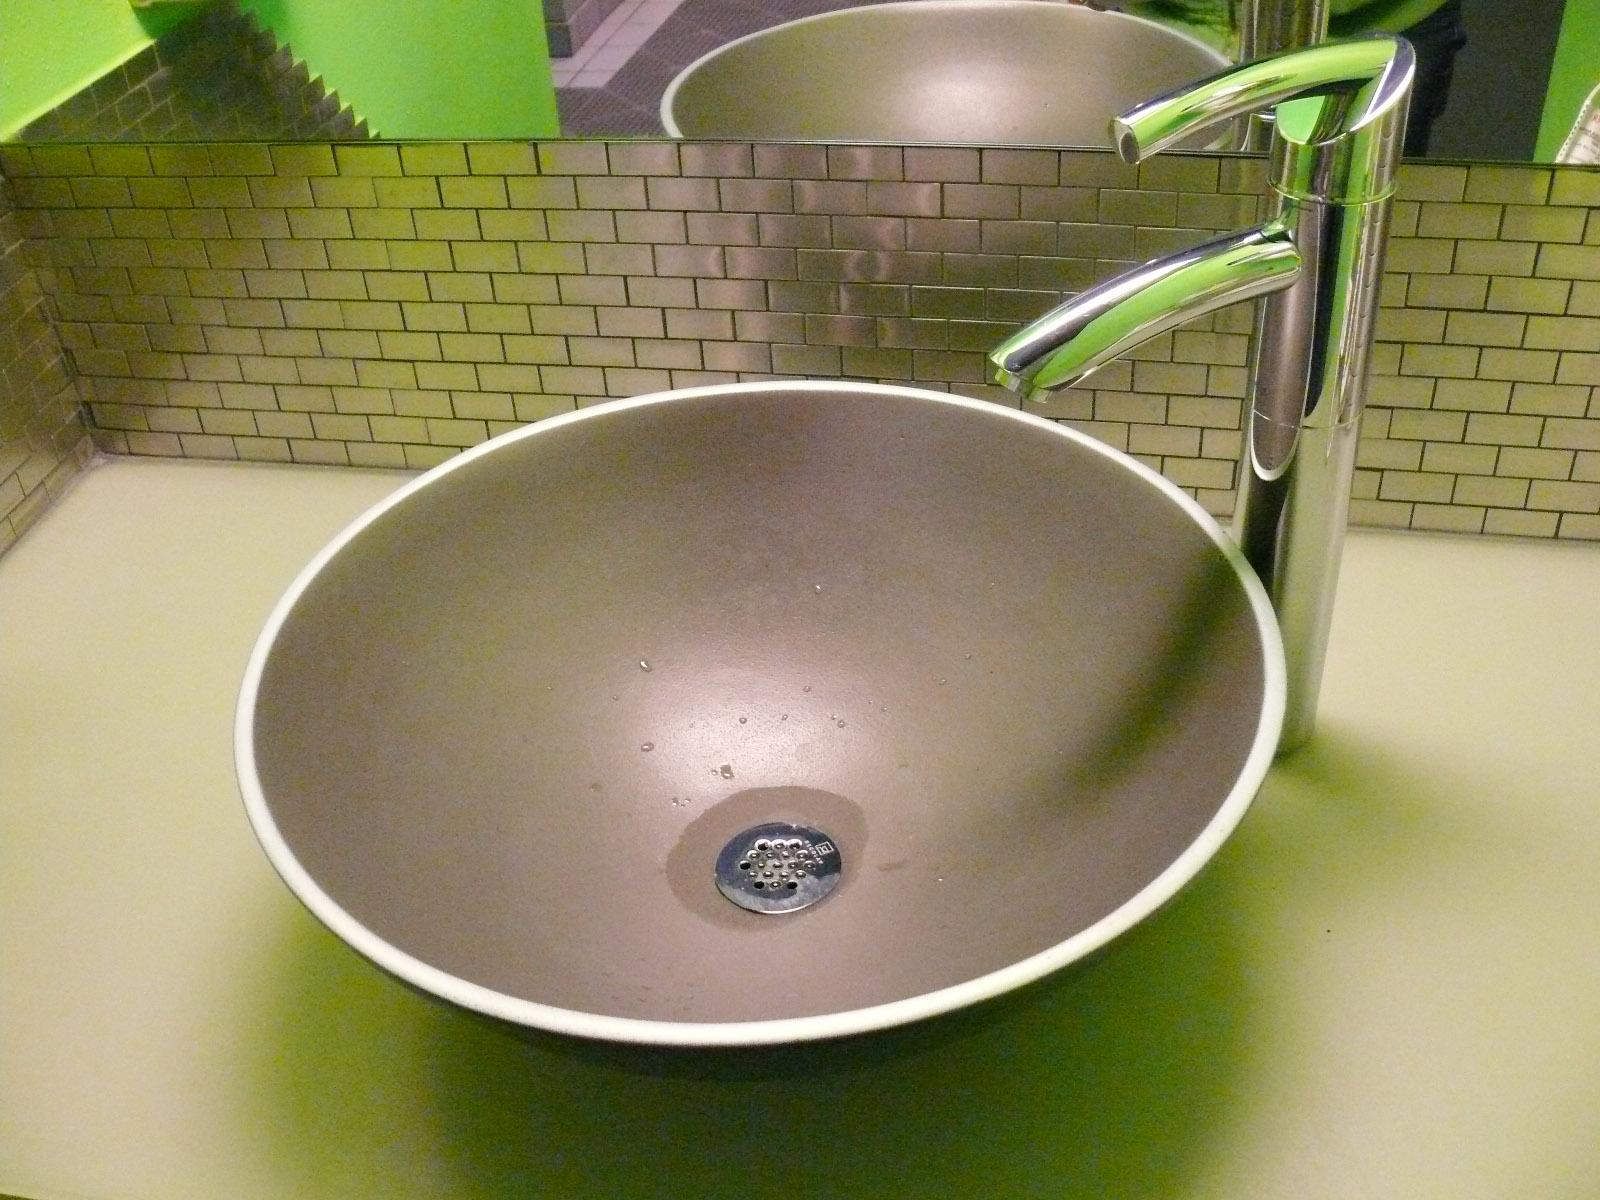 Men's Sink.jpg